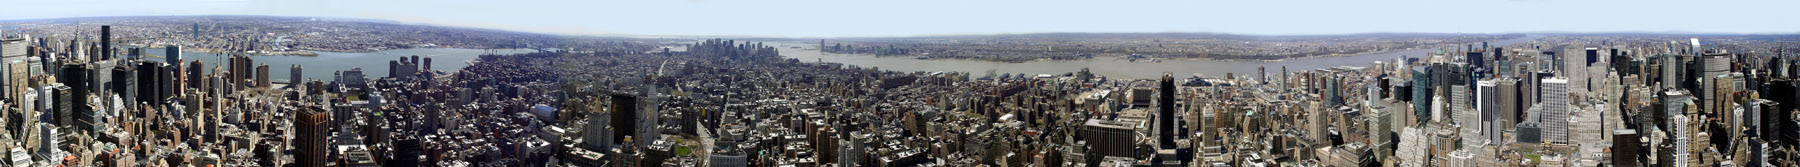 Pics Of New York Skyline. view of New York Skyline